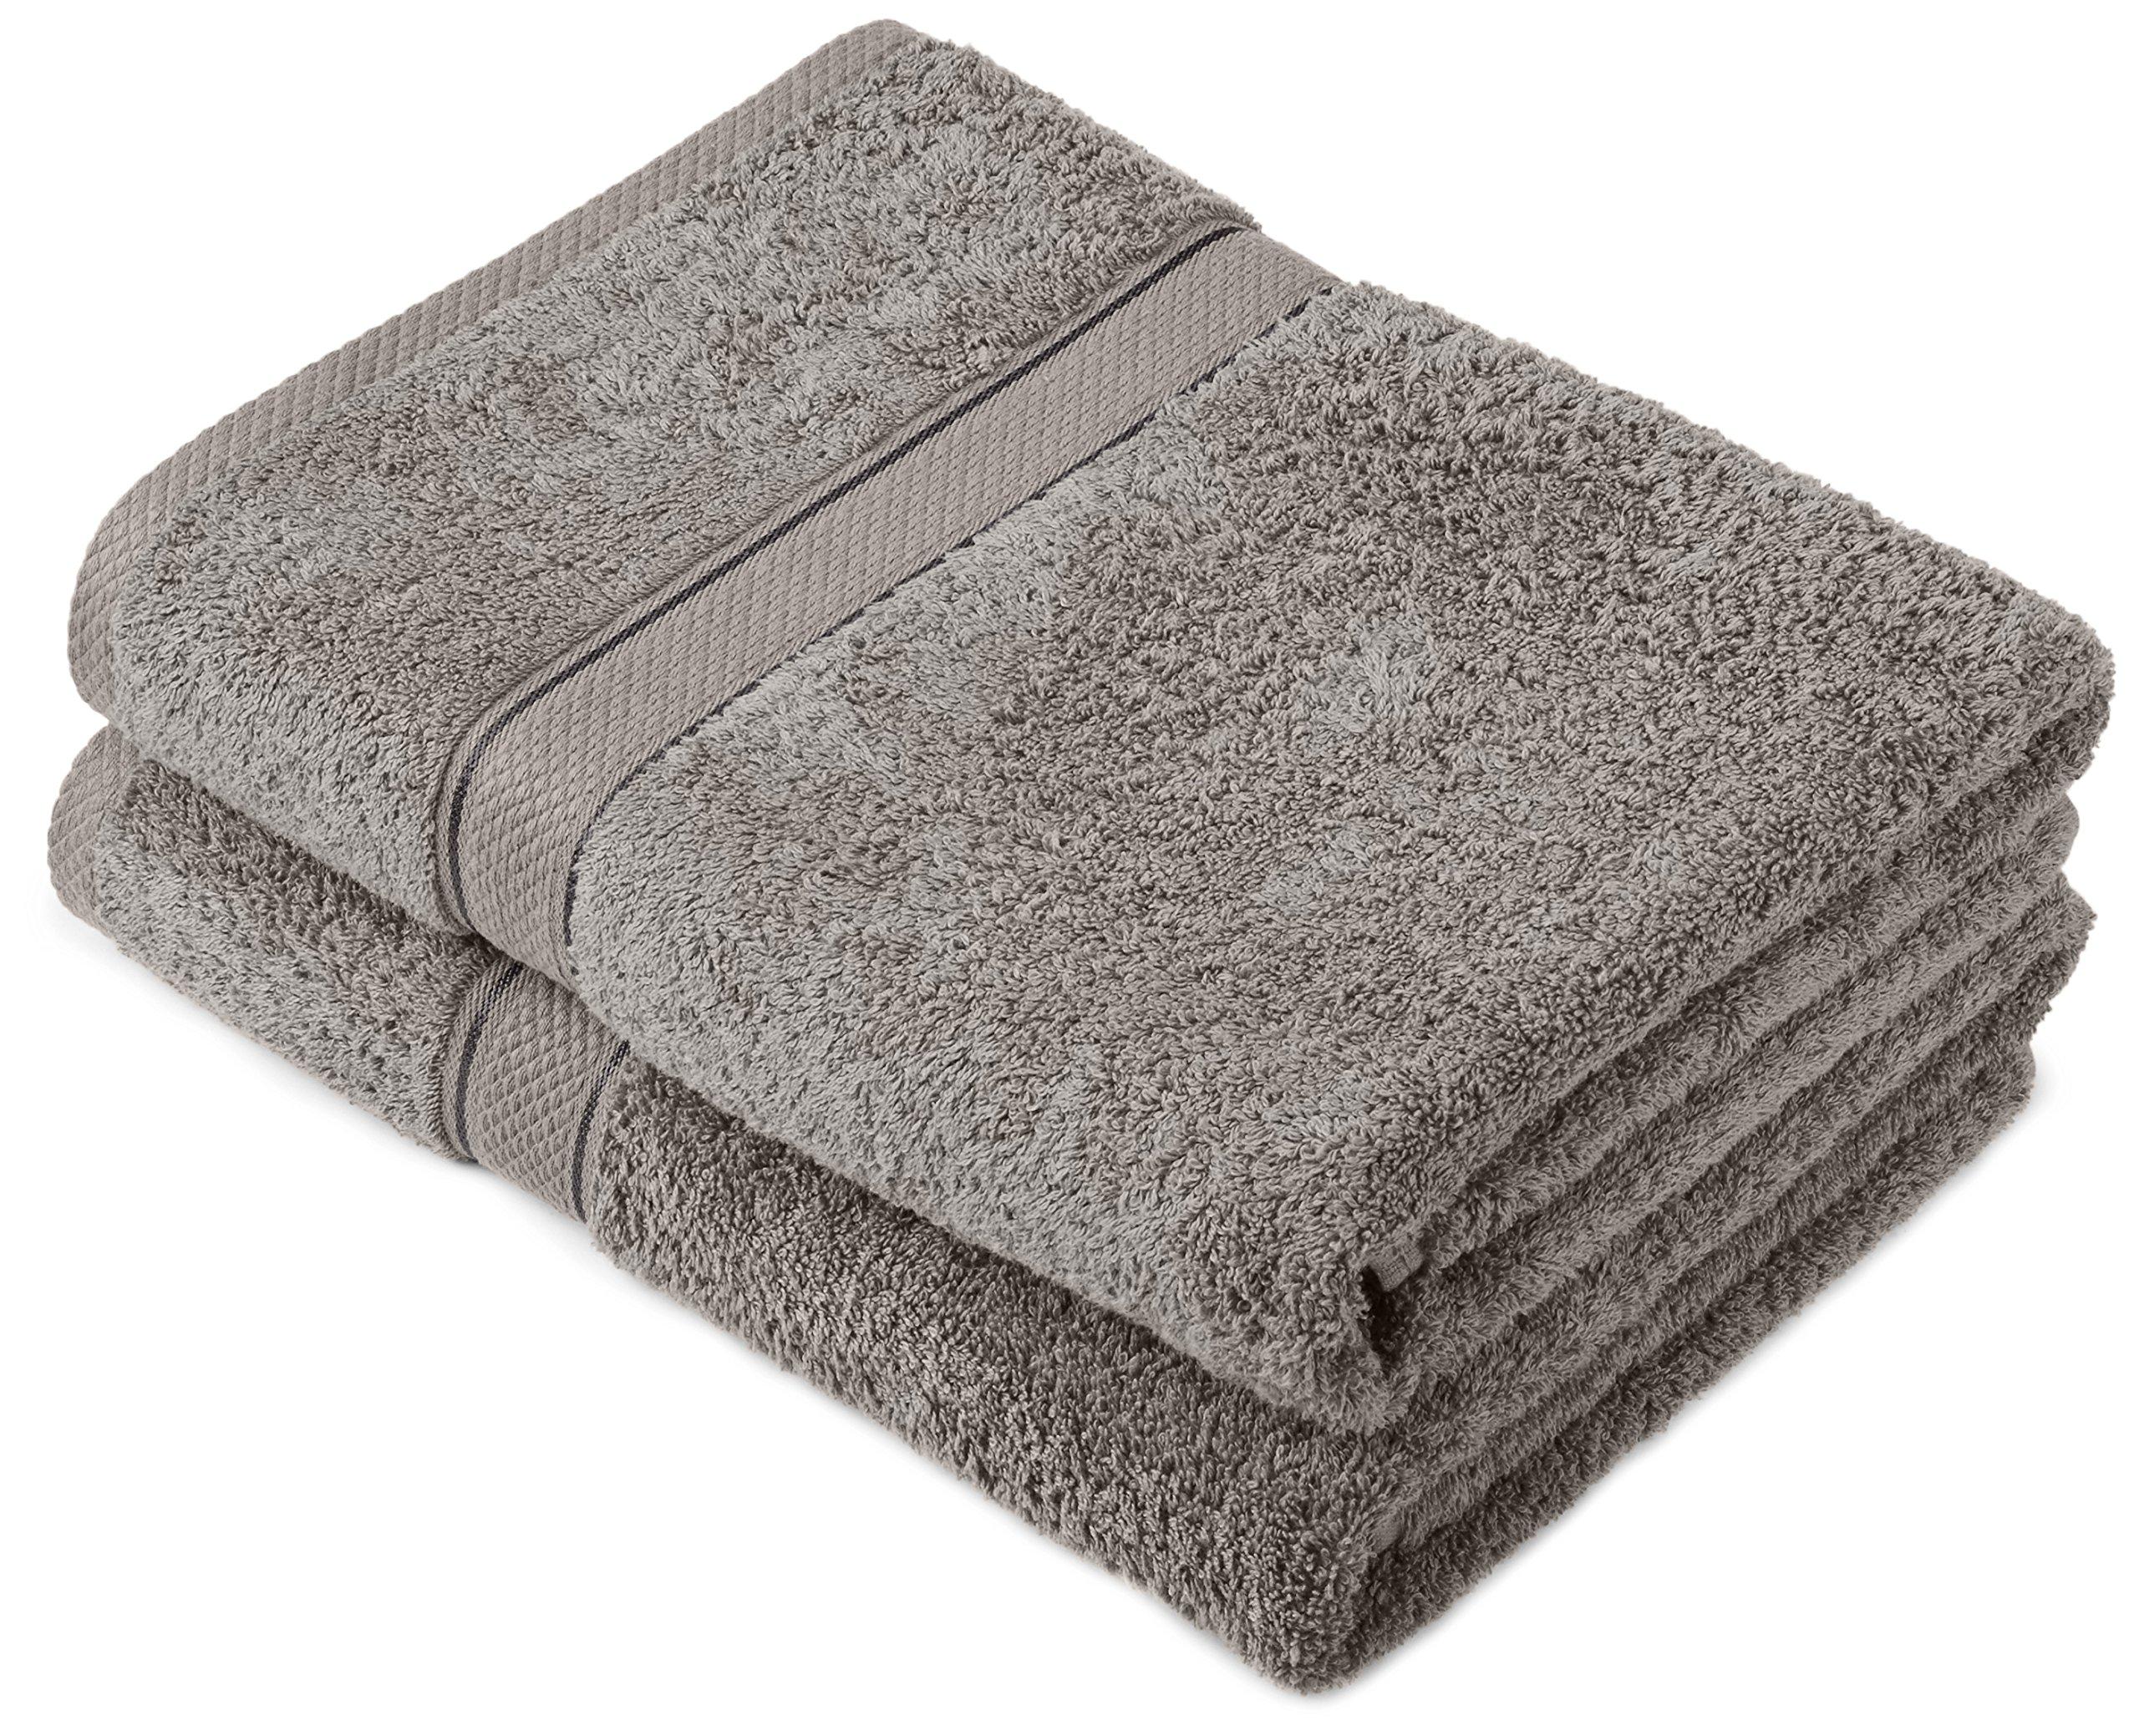 Pinzon by Amazon - Juego de toallas de algodón egipcio (2 toallas de baño)